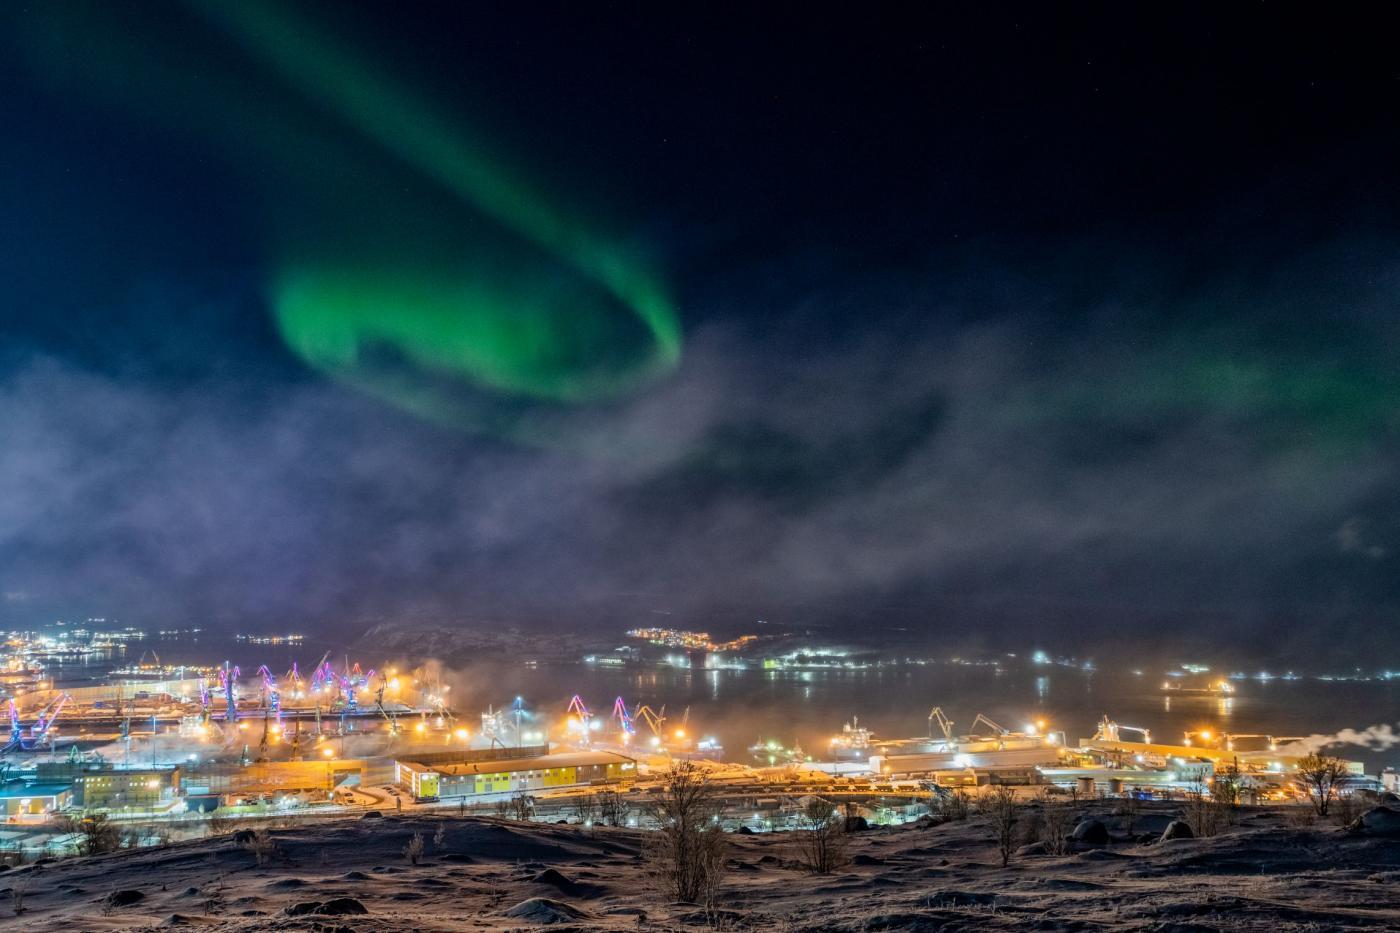 An image showing 'Aurora in Murmansk'